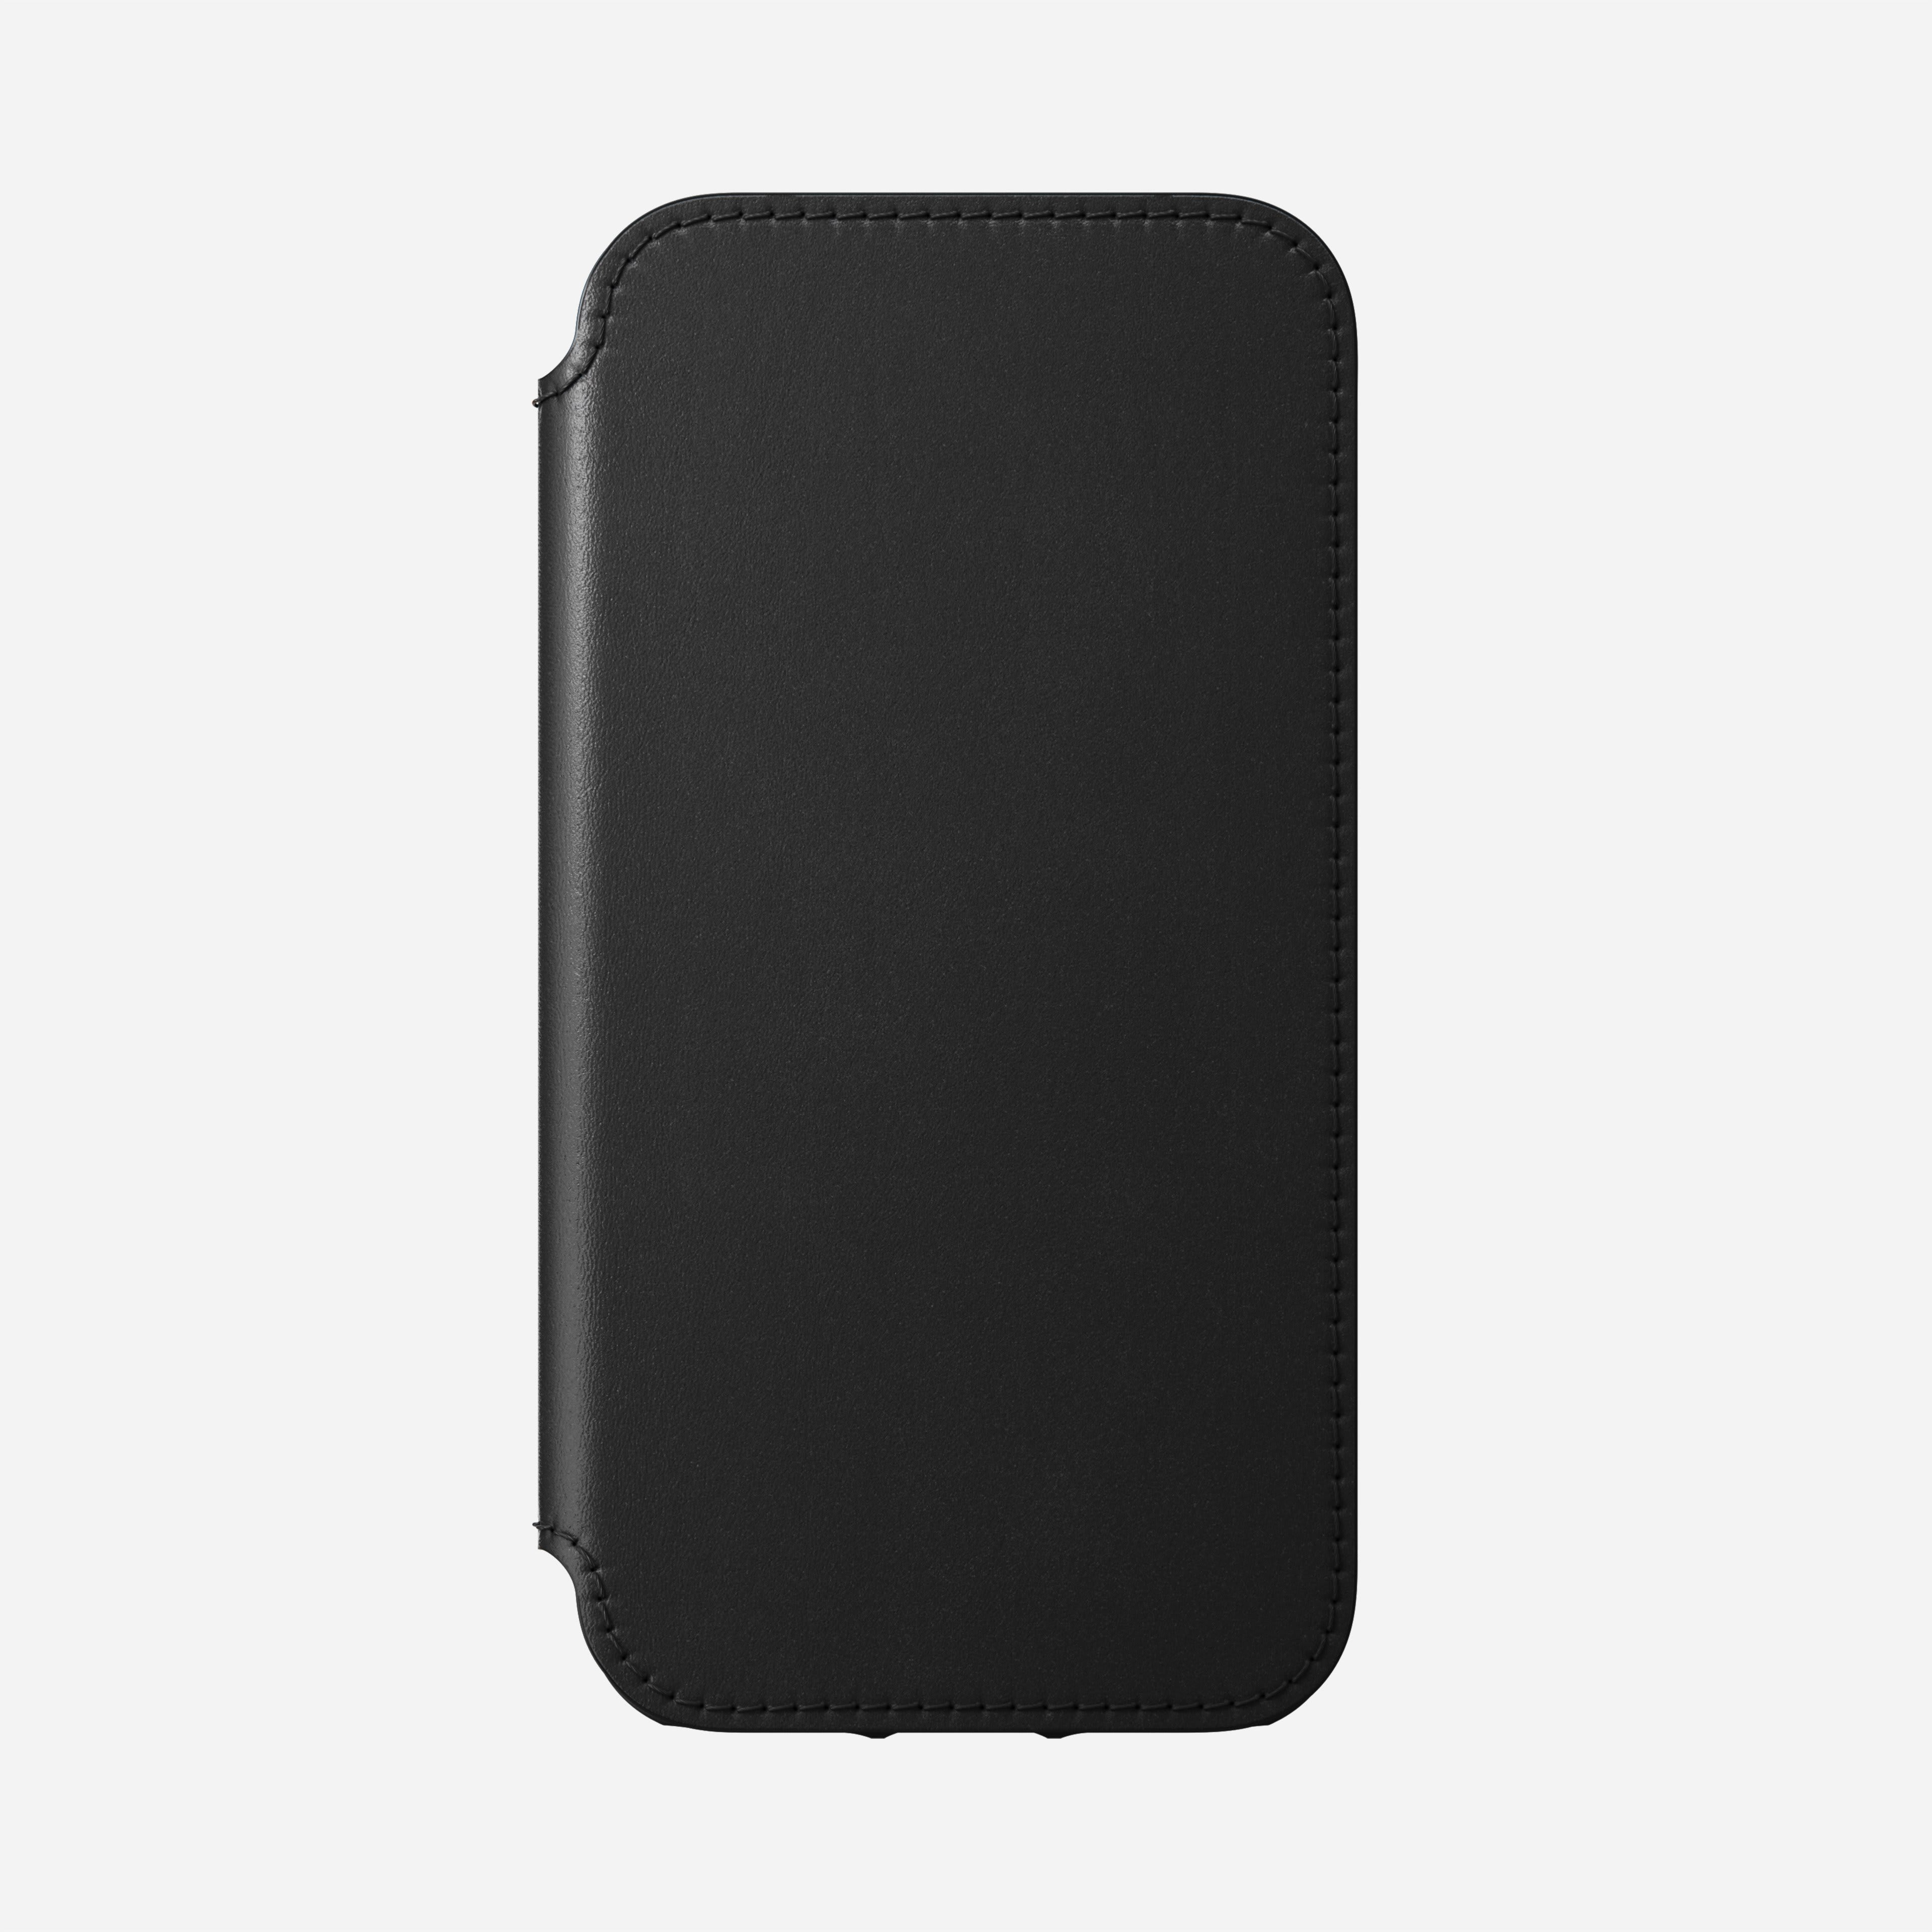 Rugged folio magsafe horween leather black iphone 12 mini